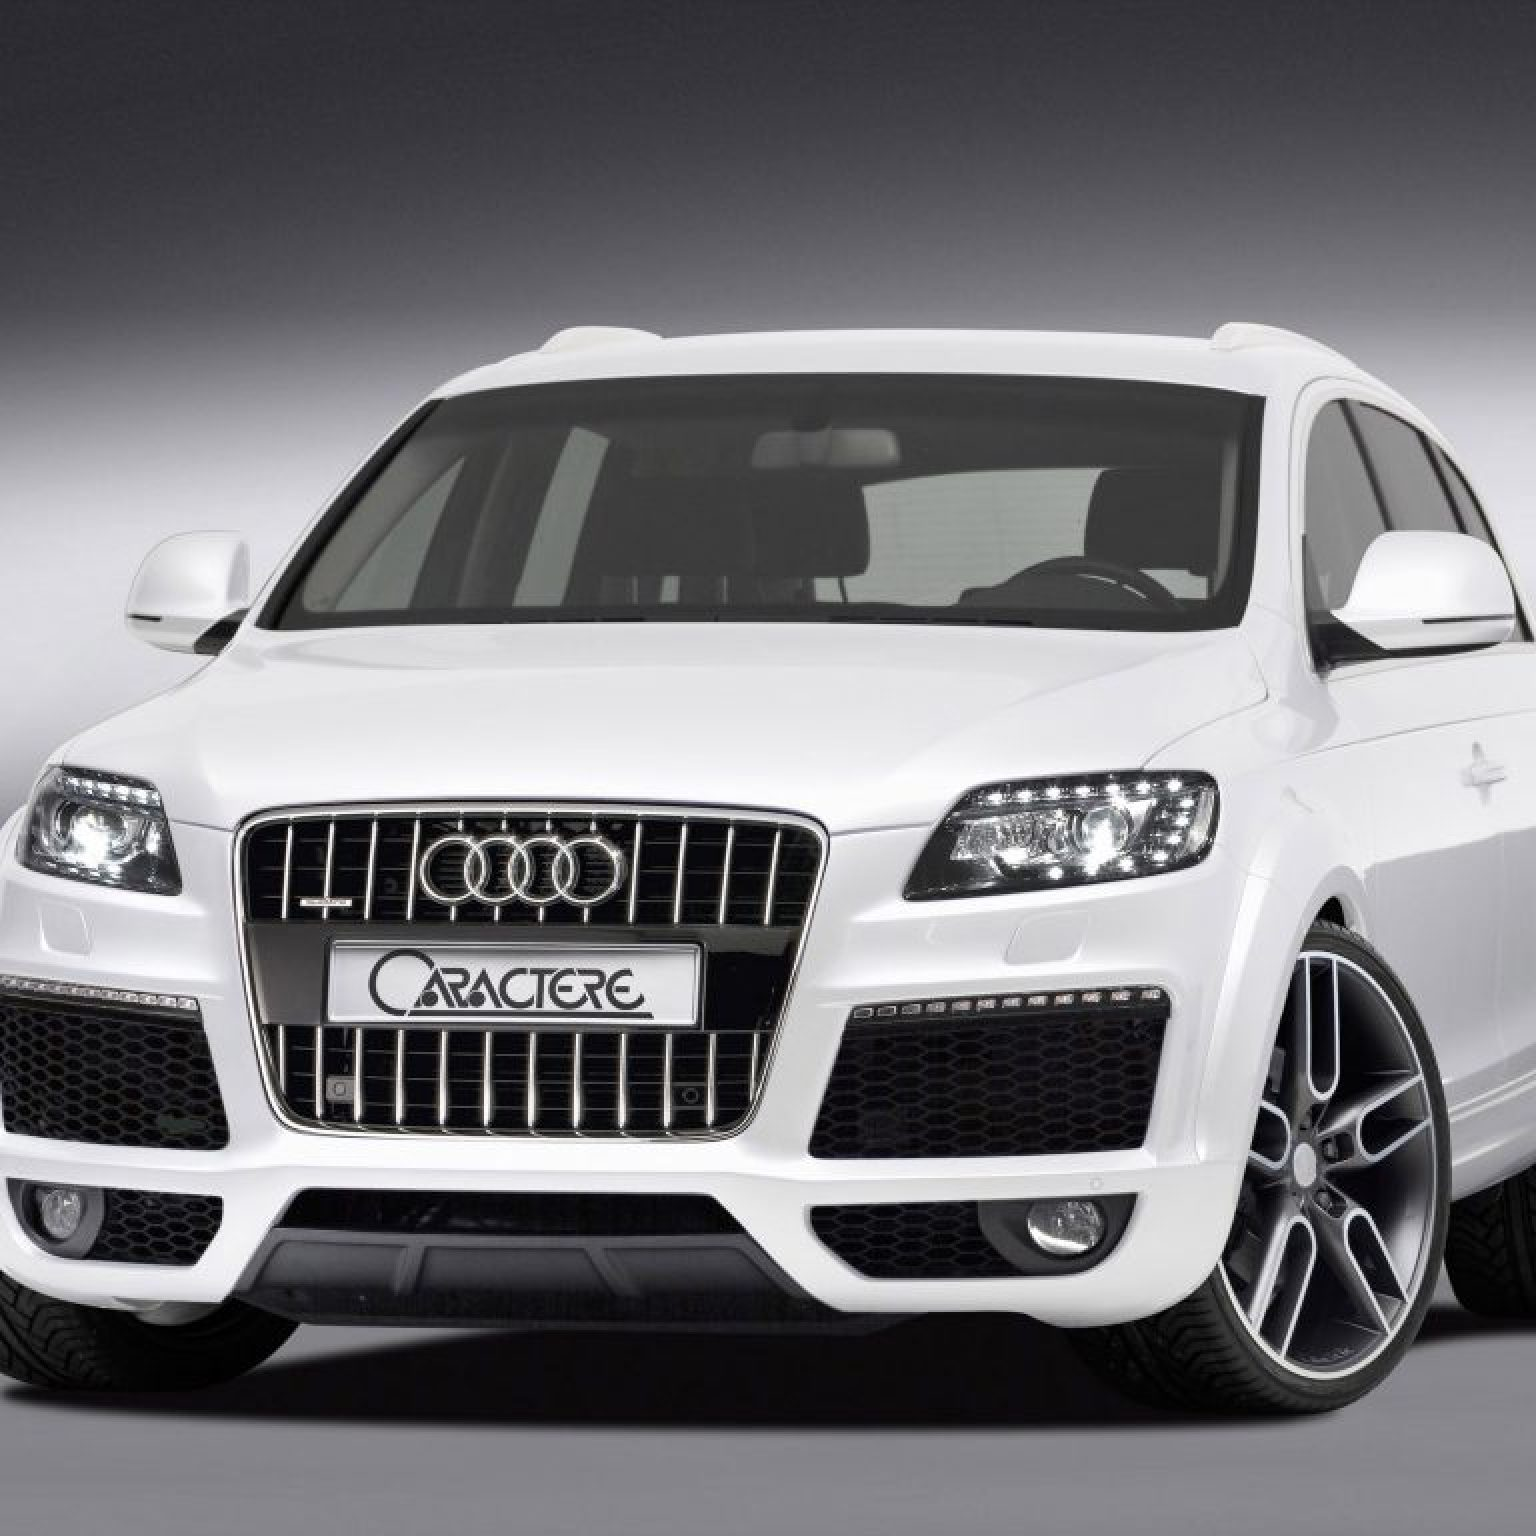 2010 Caractere Audi Q7 Facelift